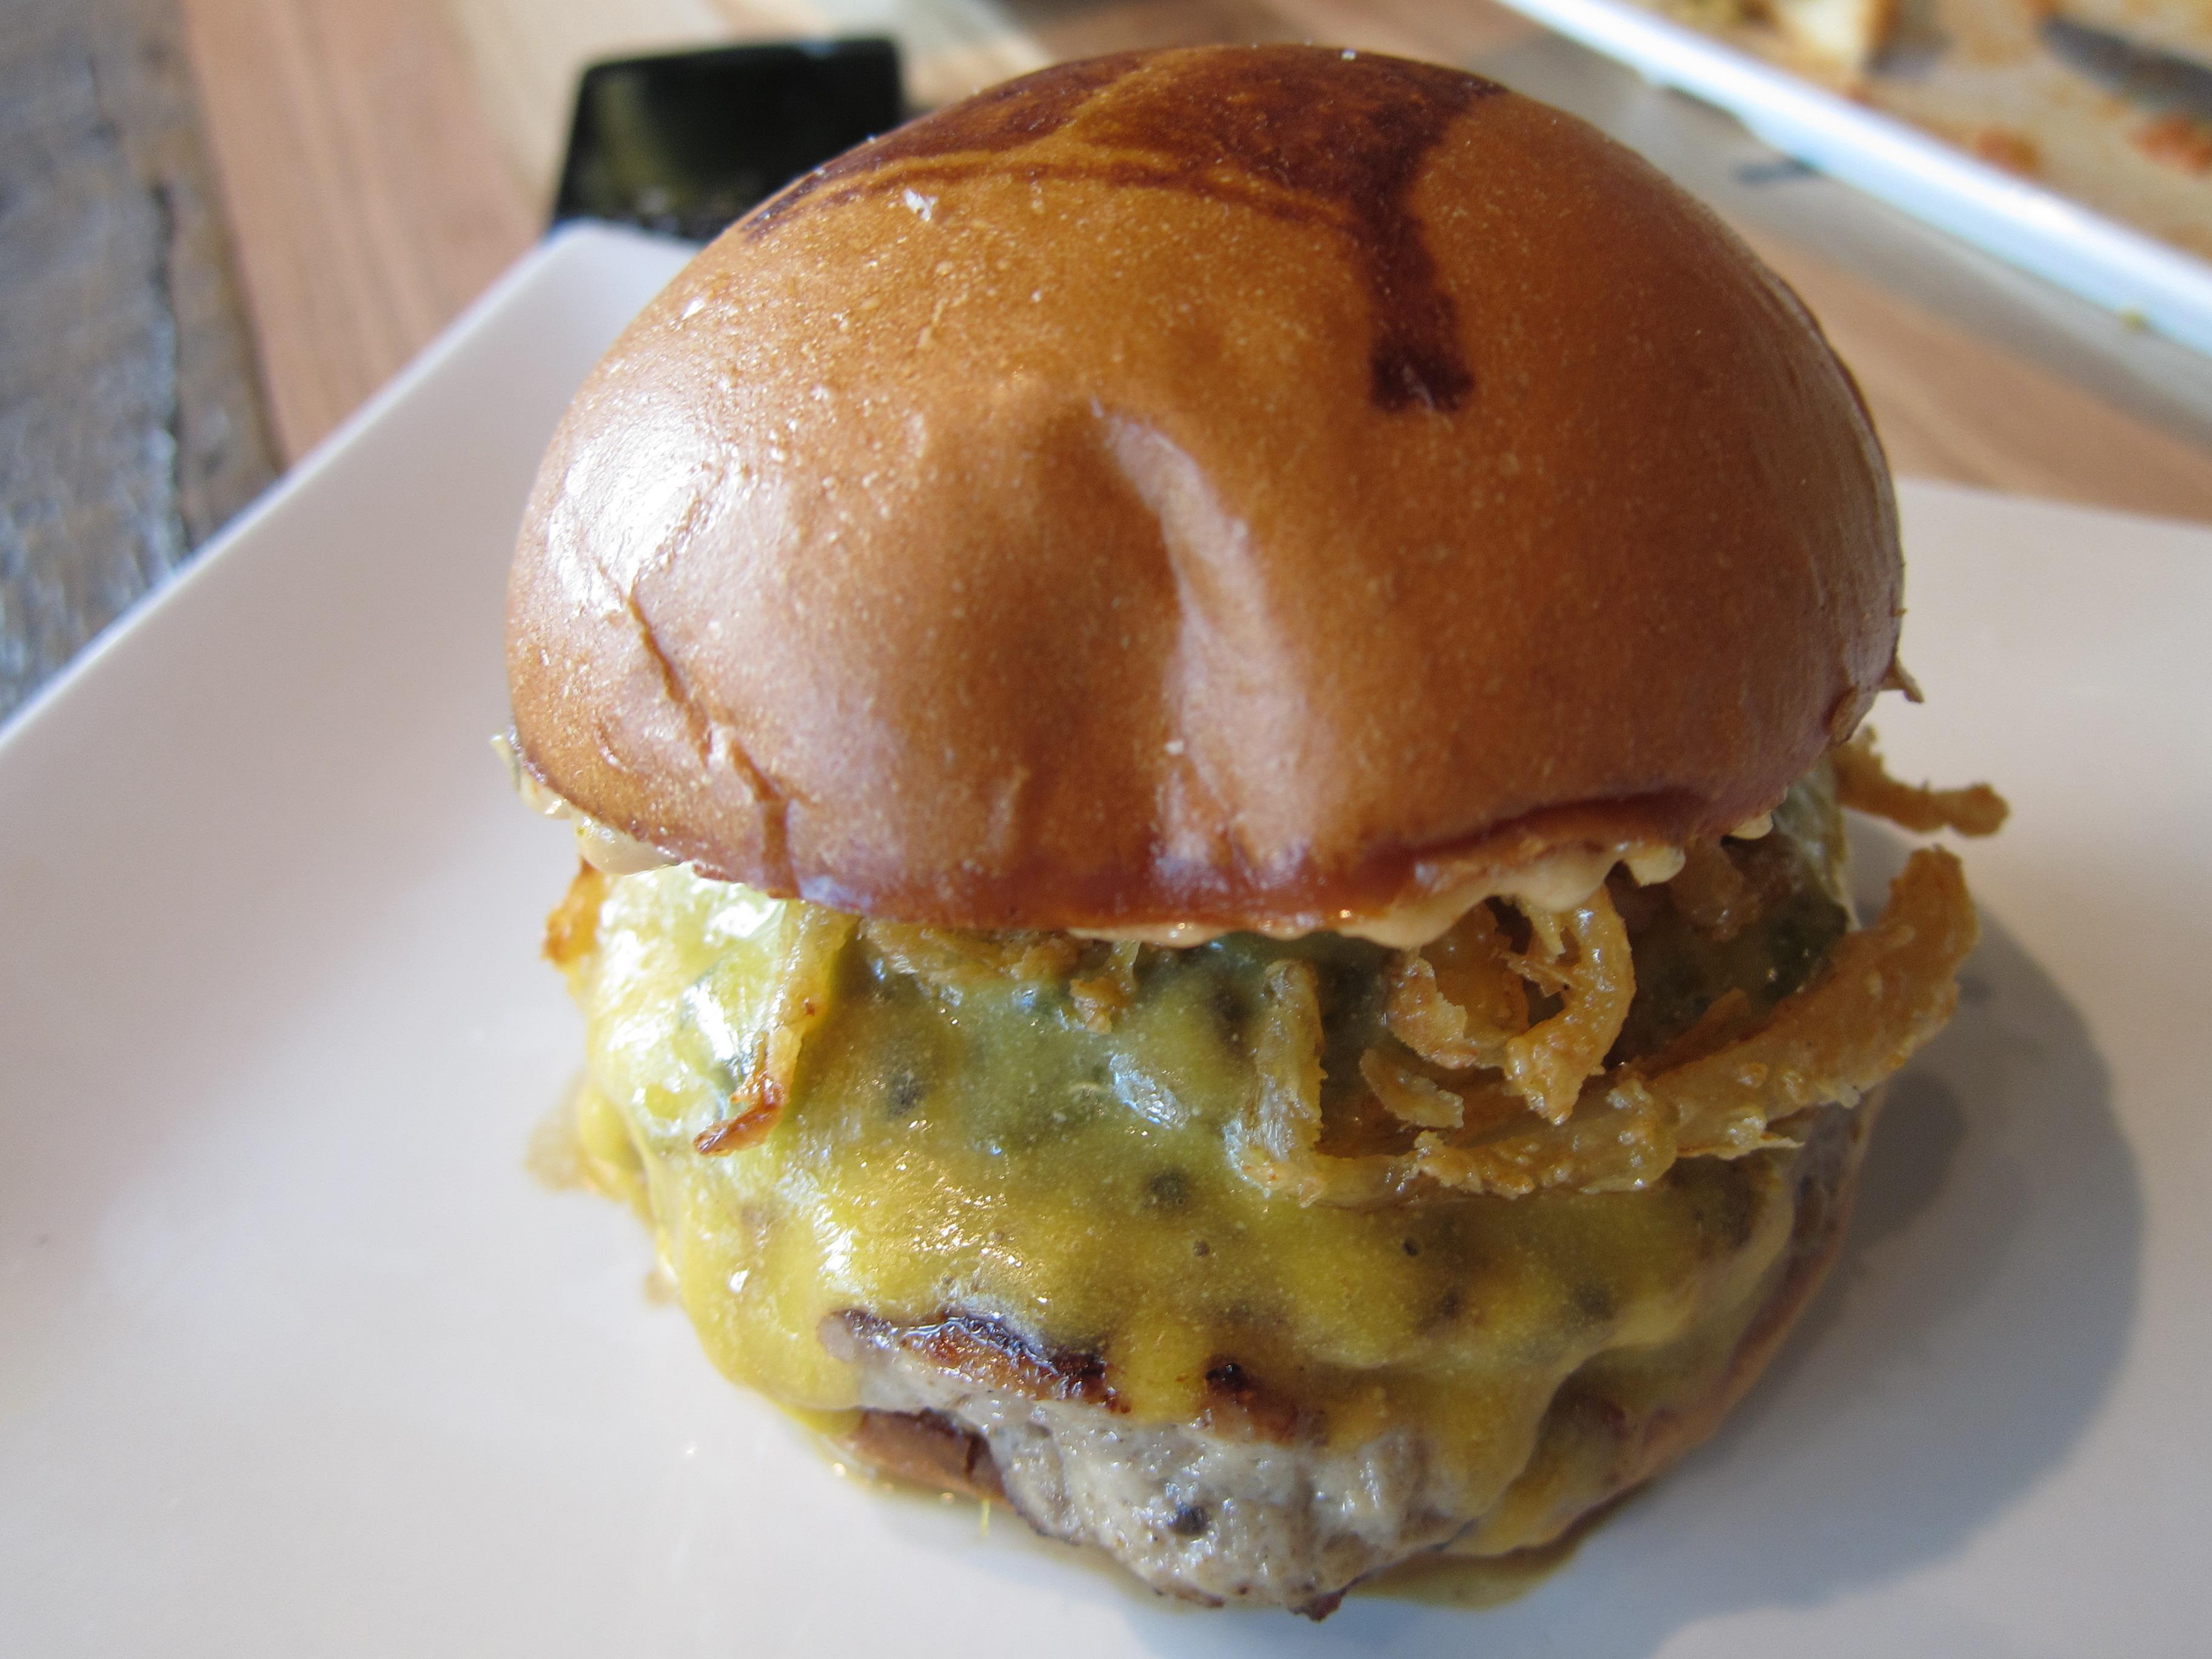 Spicy Bird Burger with turkey patty, crispy onion straws, hatch chilis ...